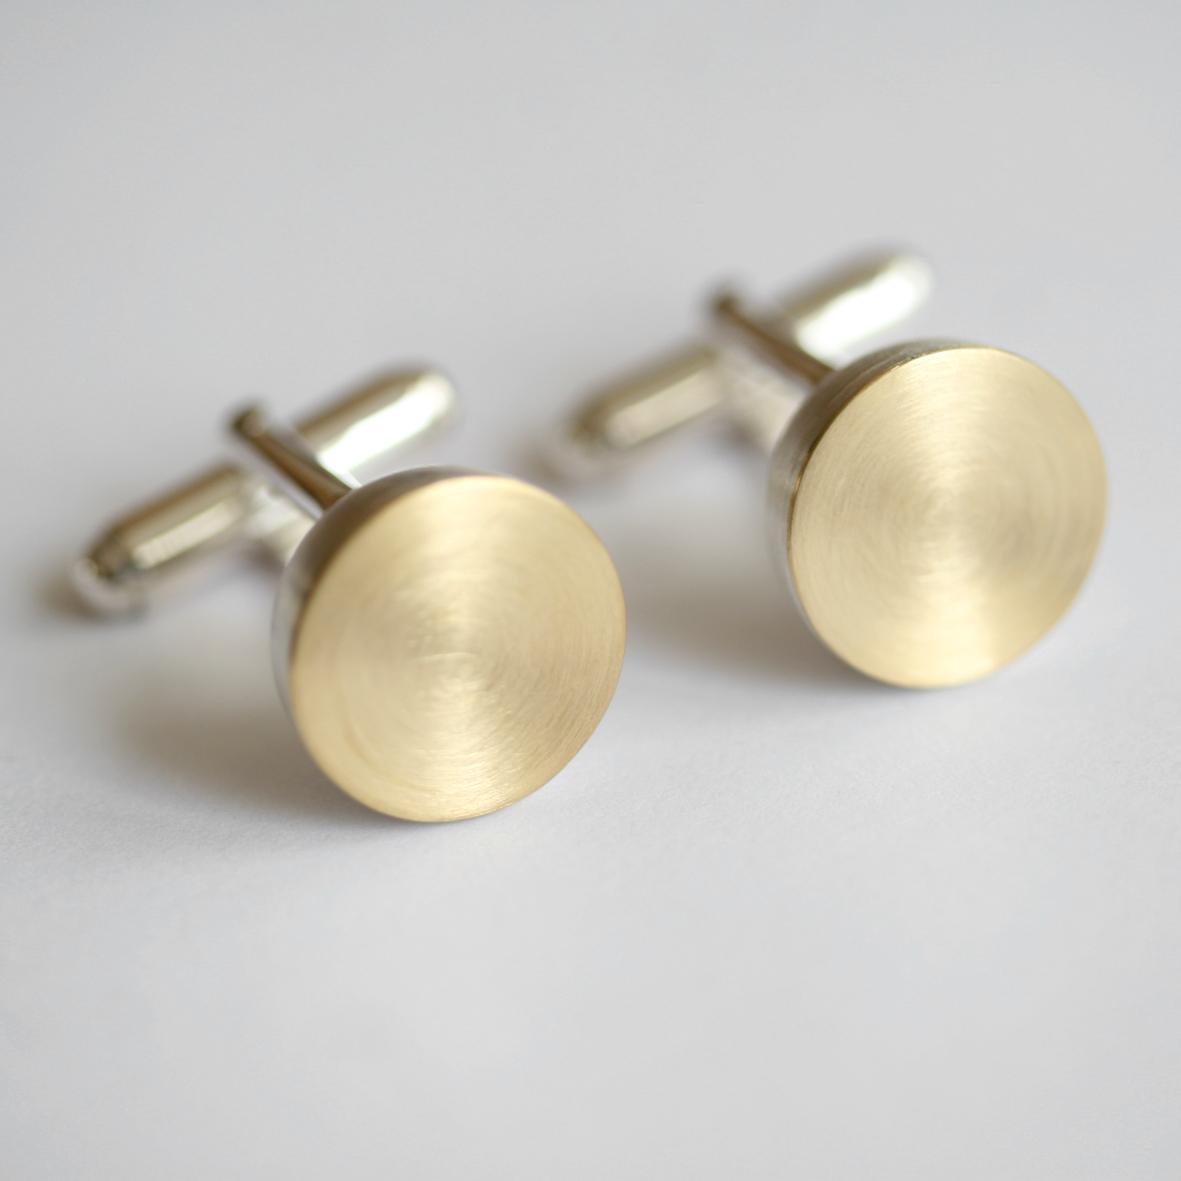 9b cuff links 18ct gold silver.jpg